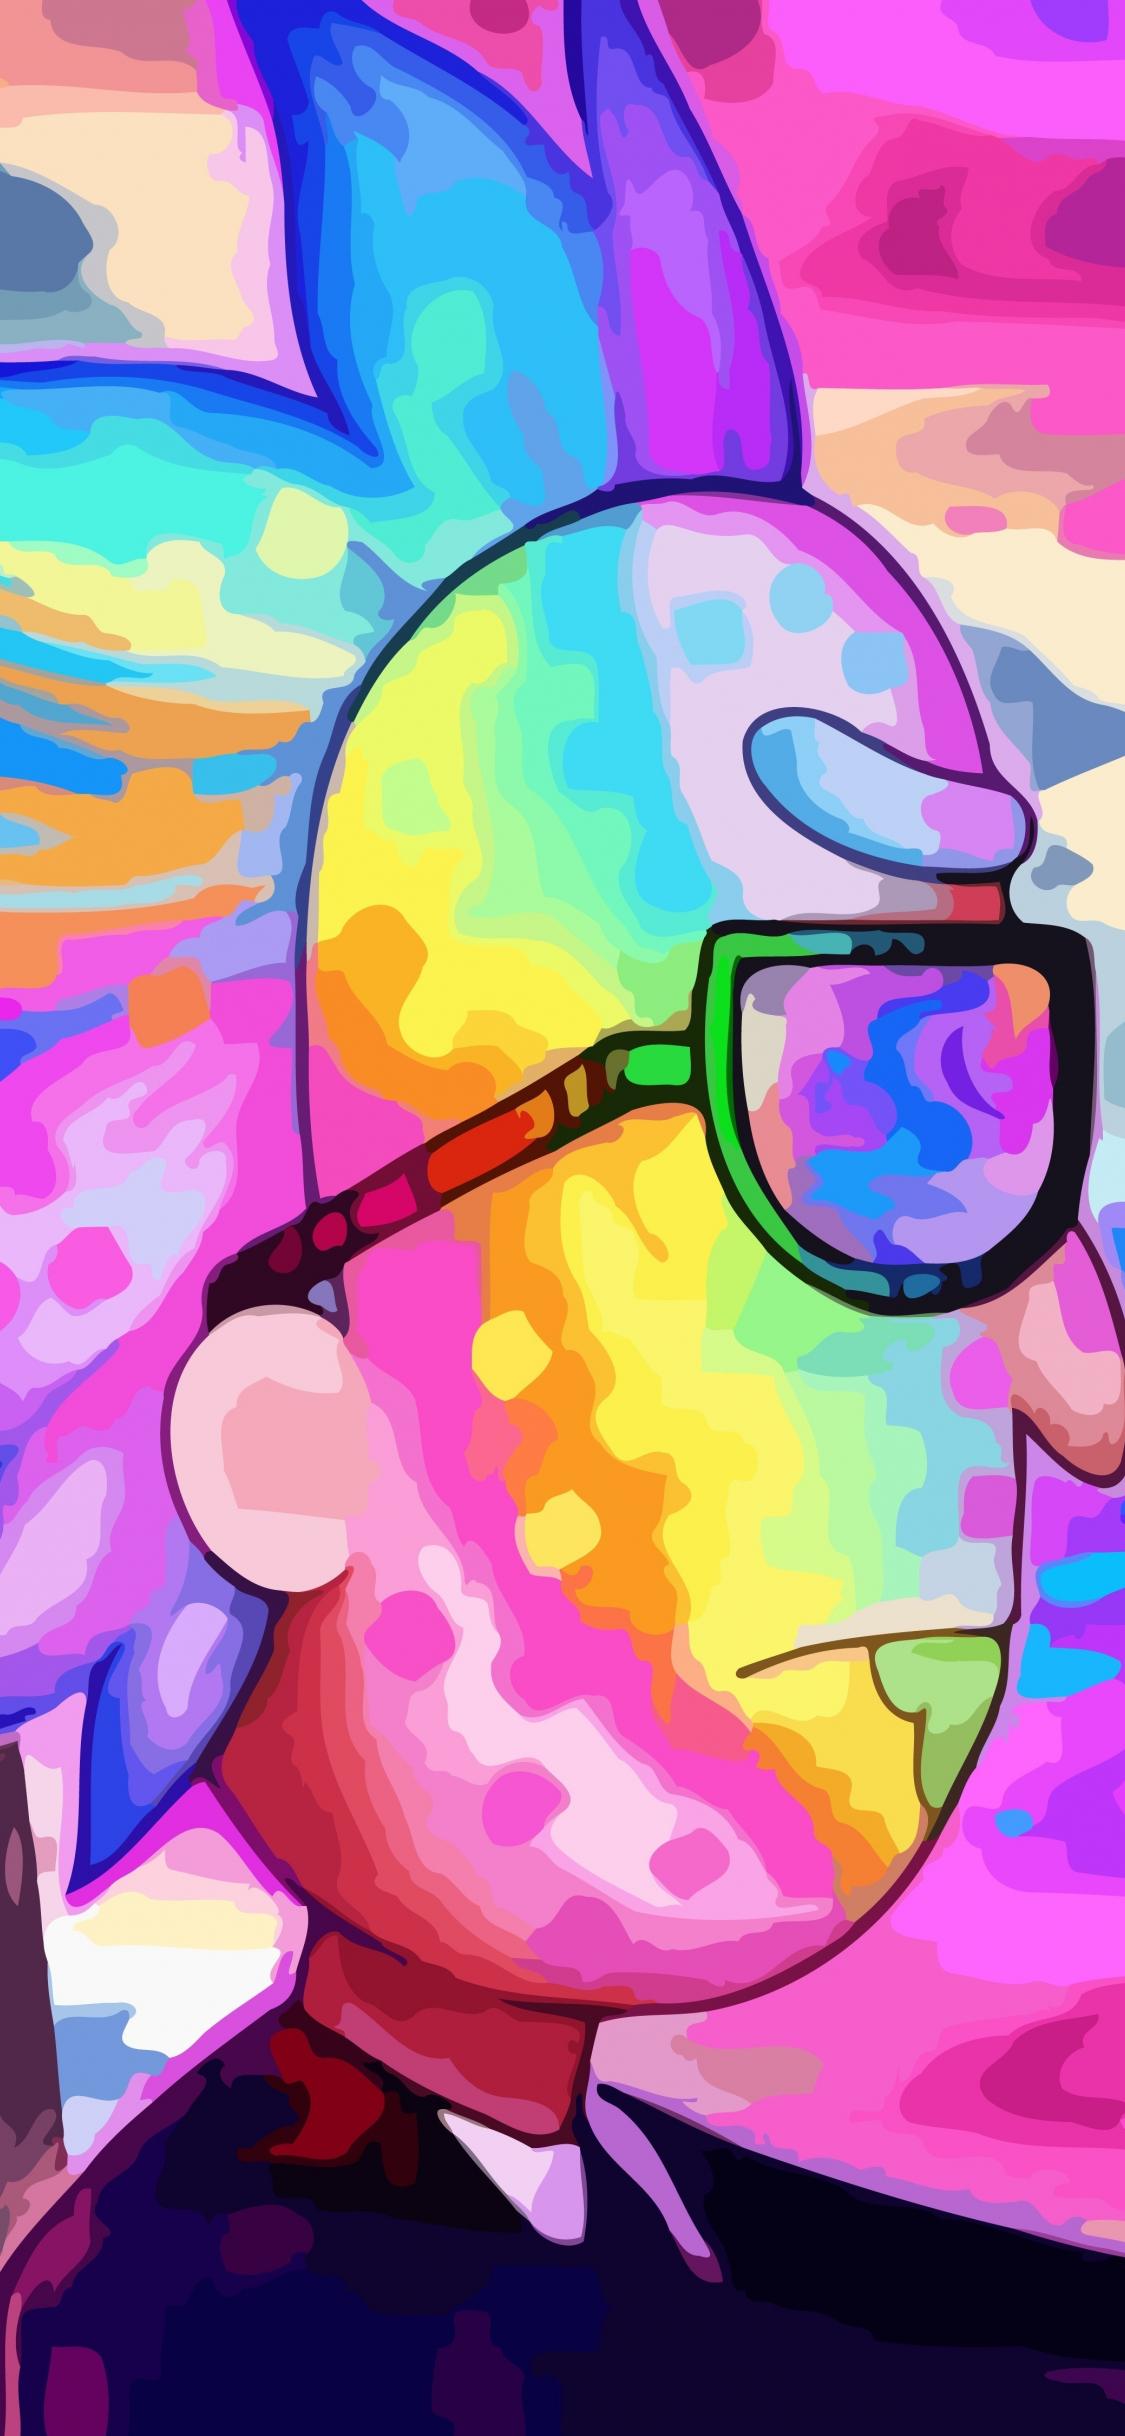 Download 1125x2436 Wallpaper Rick And Morty Rick Drive Colorful